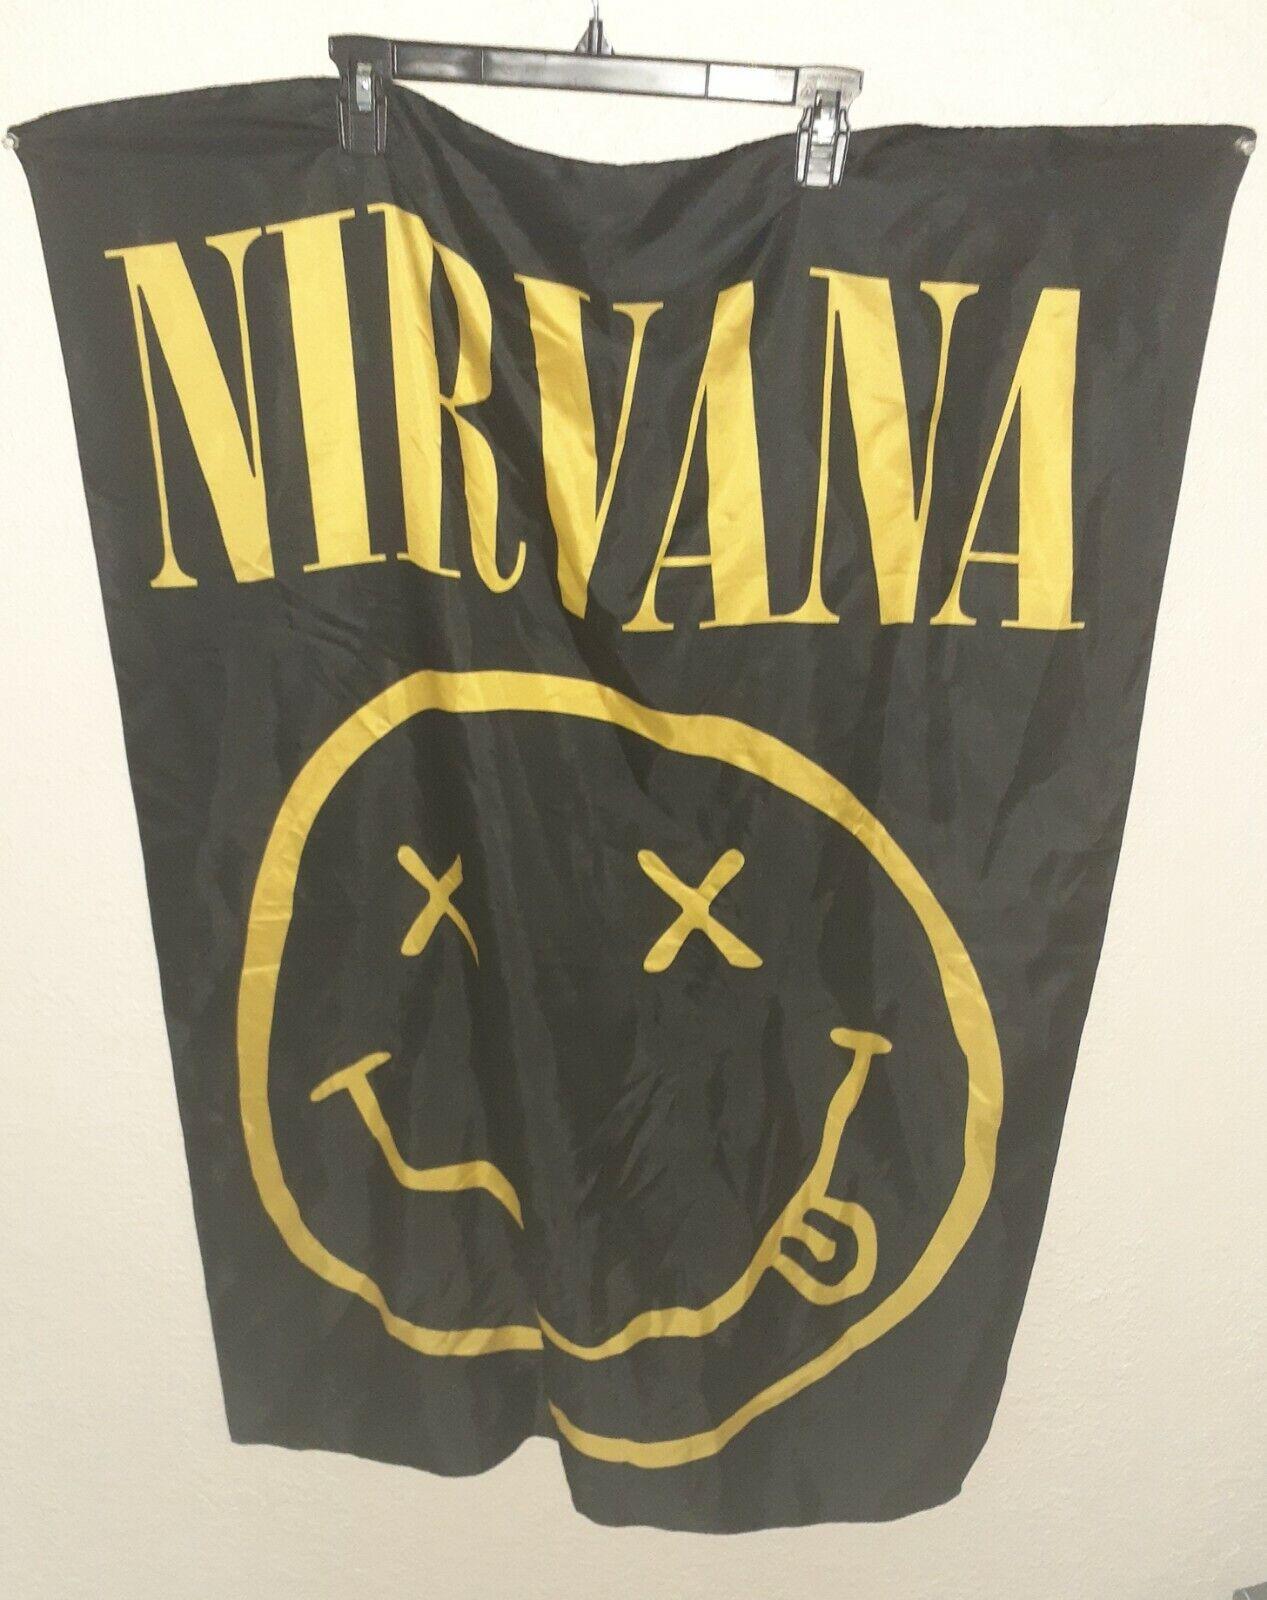 Nirvana Smiley Face Logo Print Sheer Scarf Made in Italy